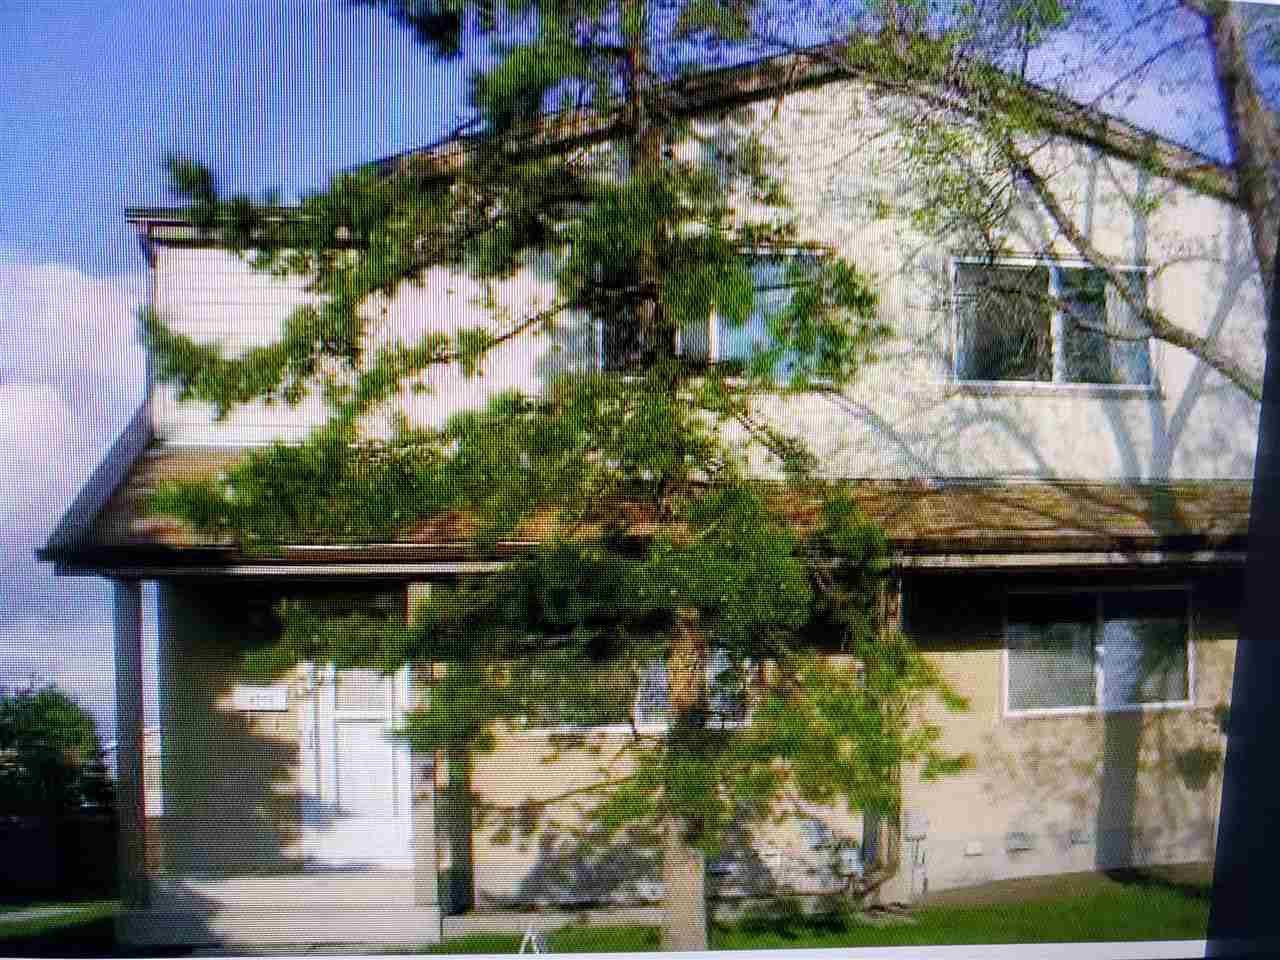 Main Photo: 4711 35 Avenue in Edmonton: Zone 29 Townhouse for sale : MLS®# E4180294